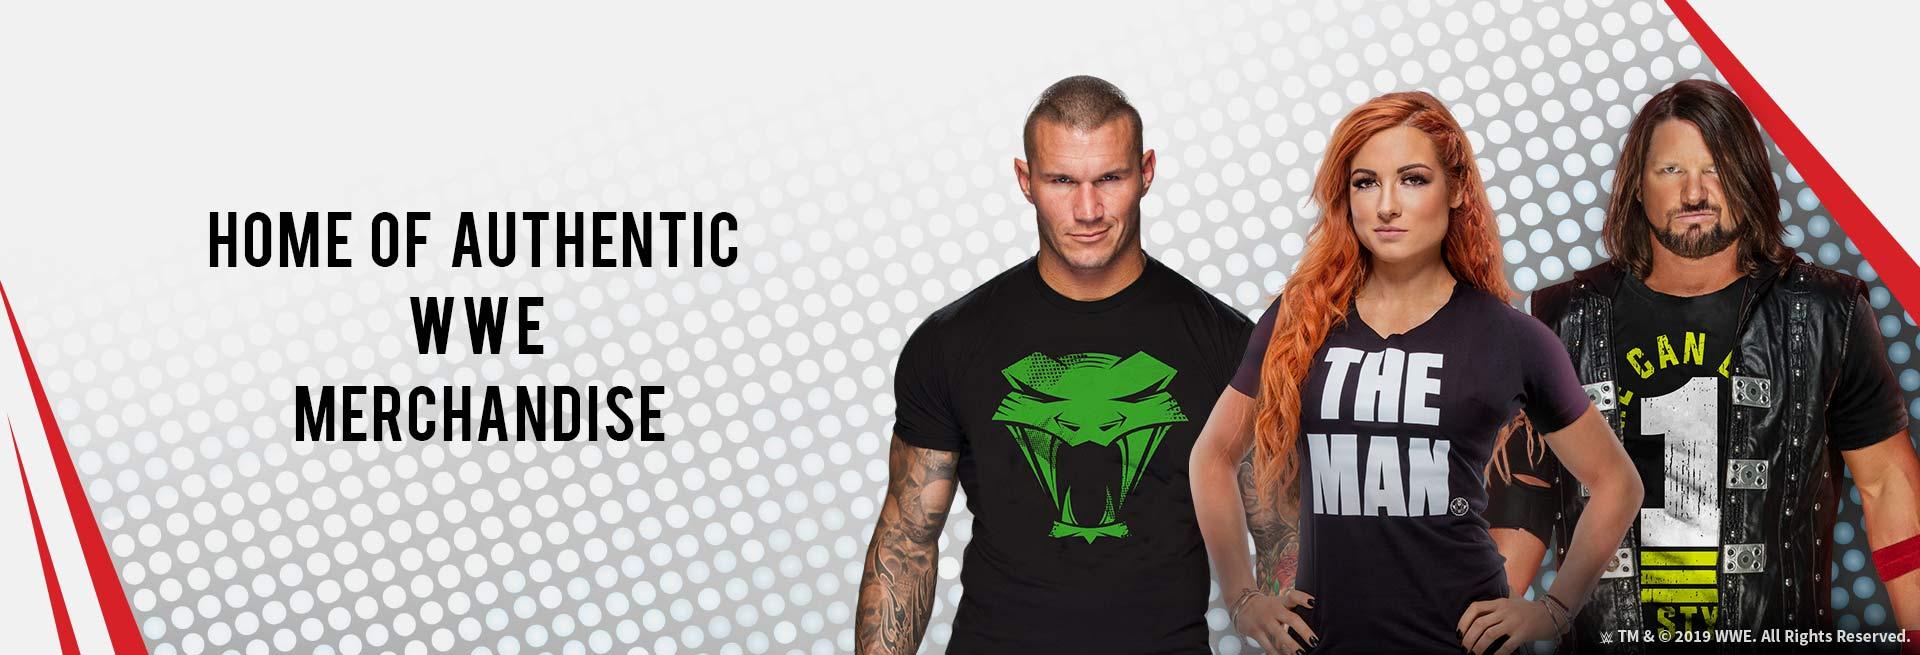 db37ce0fce New WWE Homepage Banner